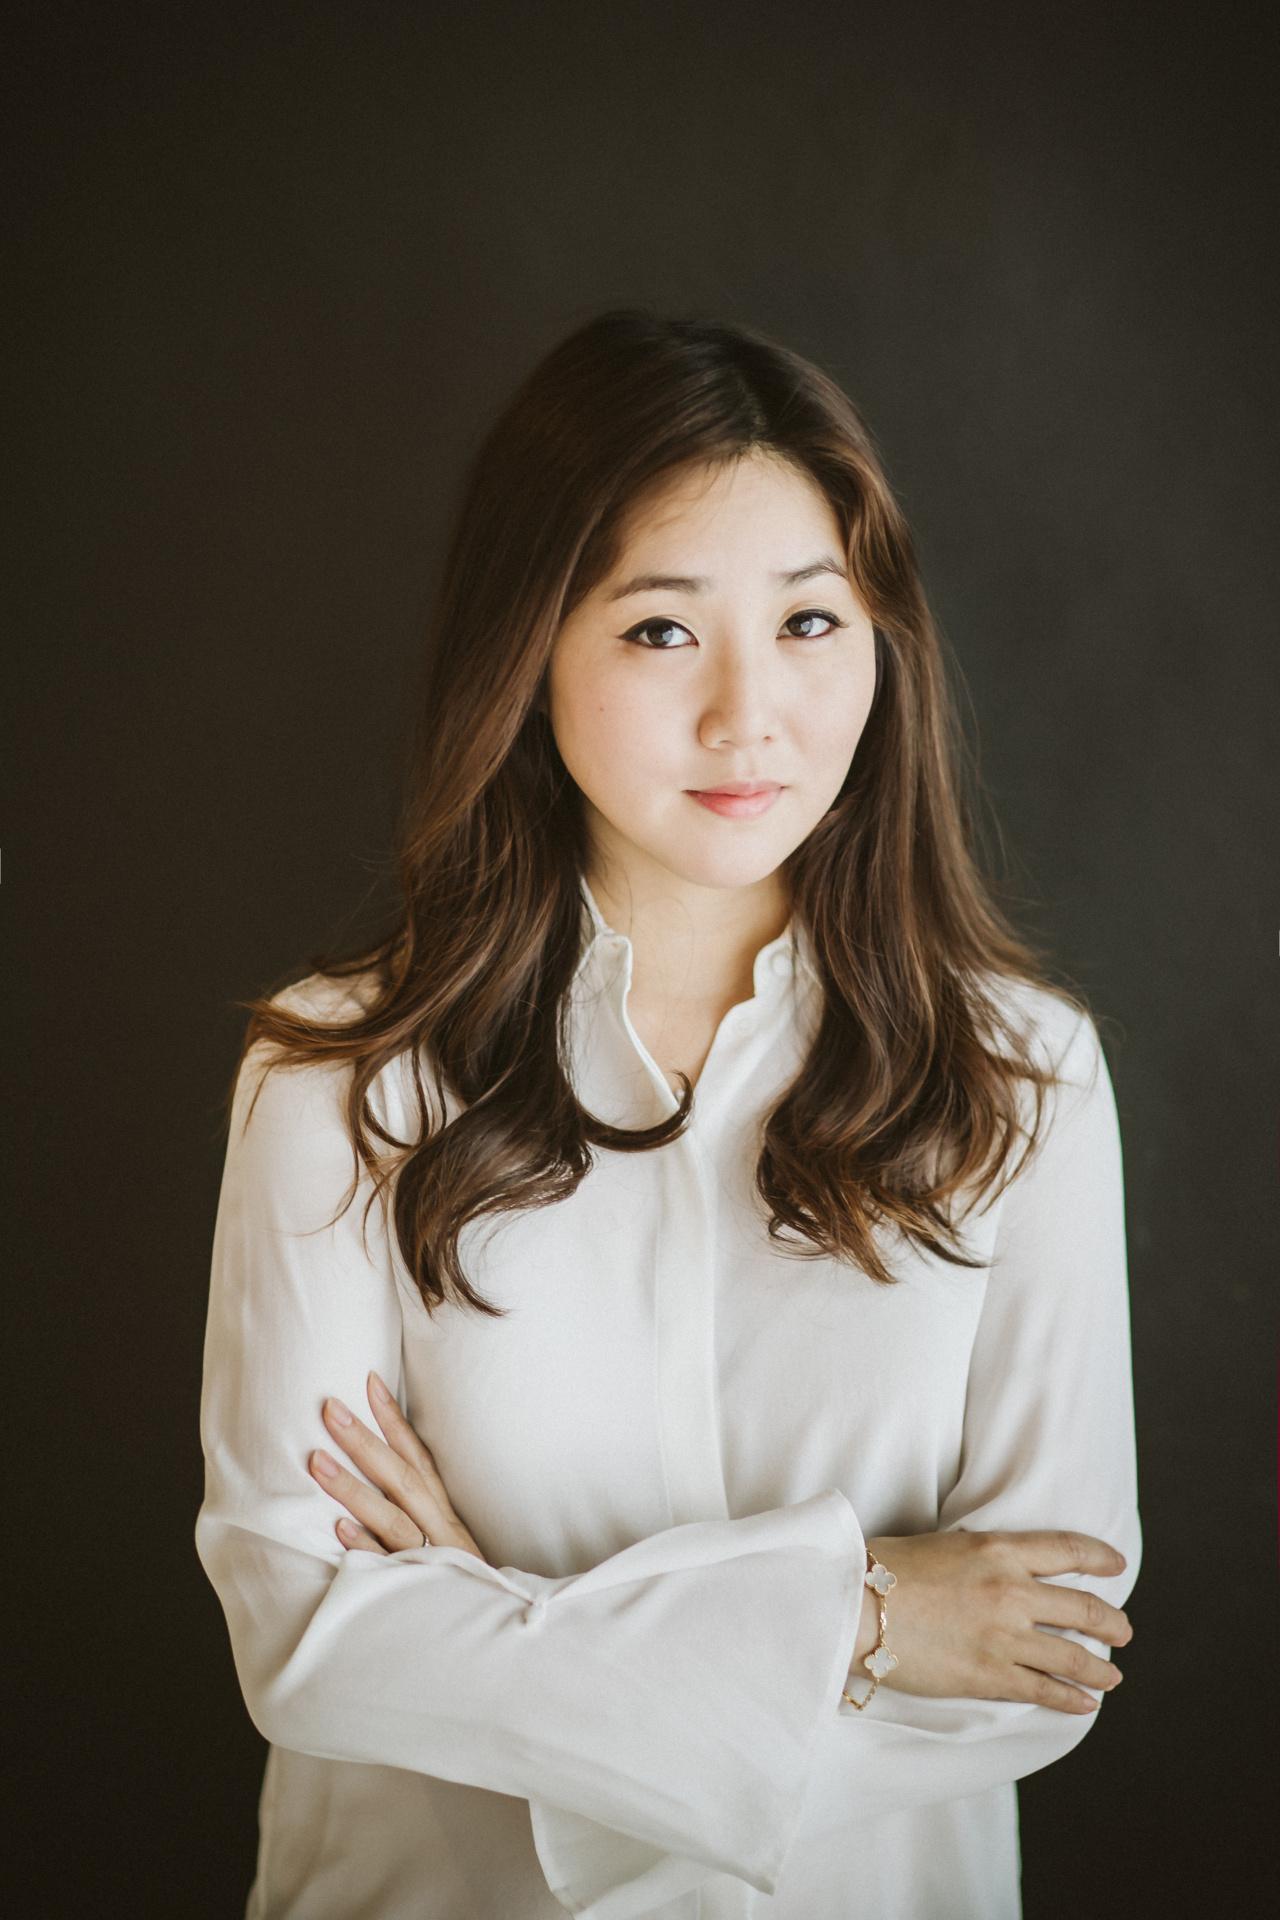 """If I Had Your Face"" author Frances Cha (Penguin Random House"